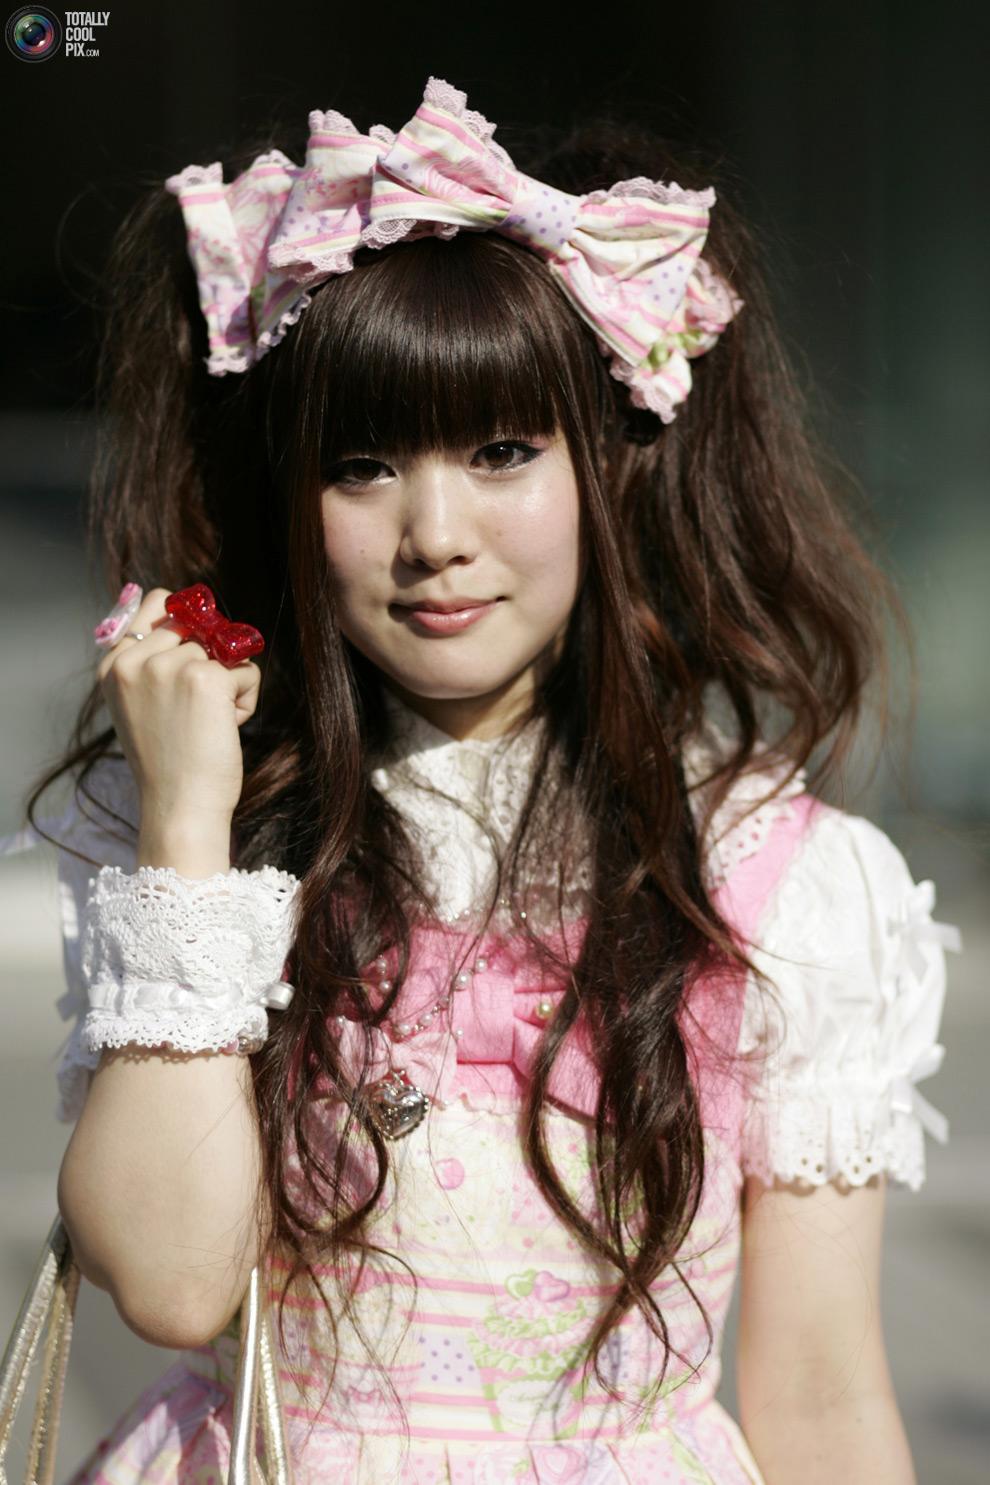 Sweet lolita, forrás: http://www.nado.li/wp-content/uploads/2013/07/lolita_51.jpg